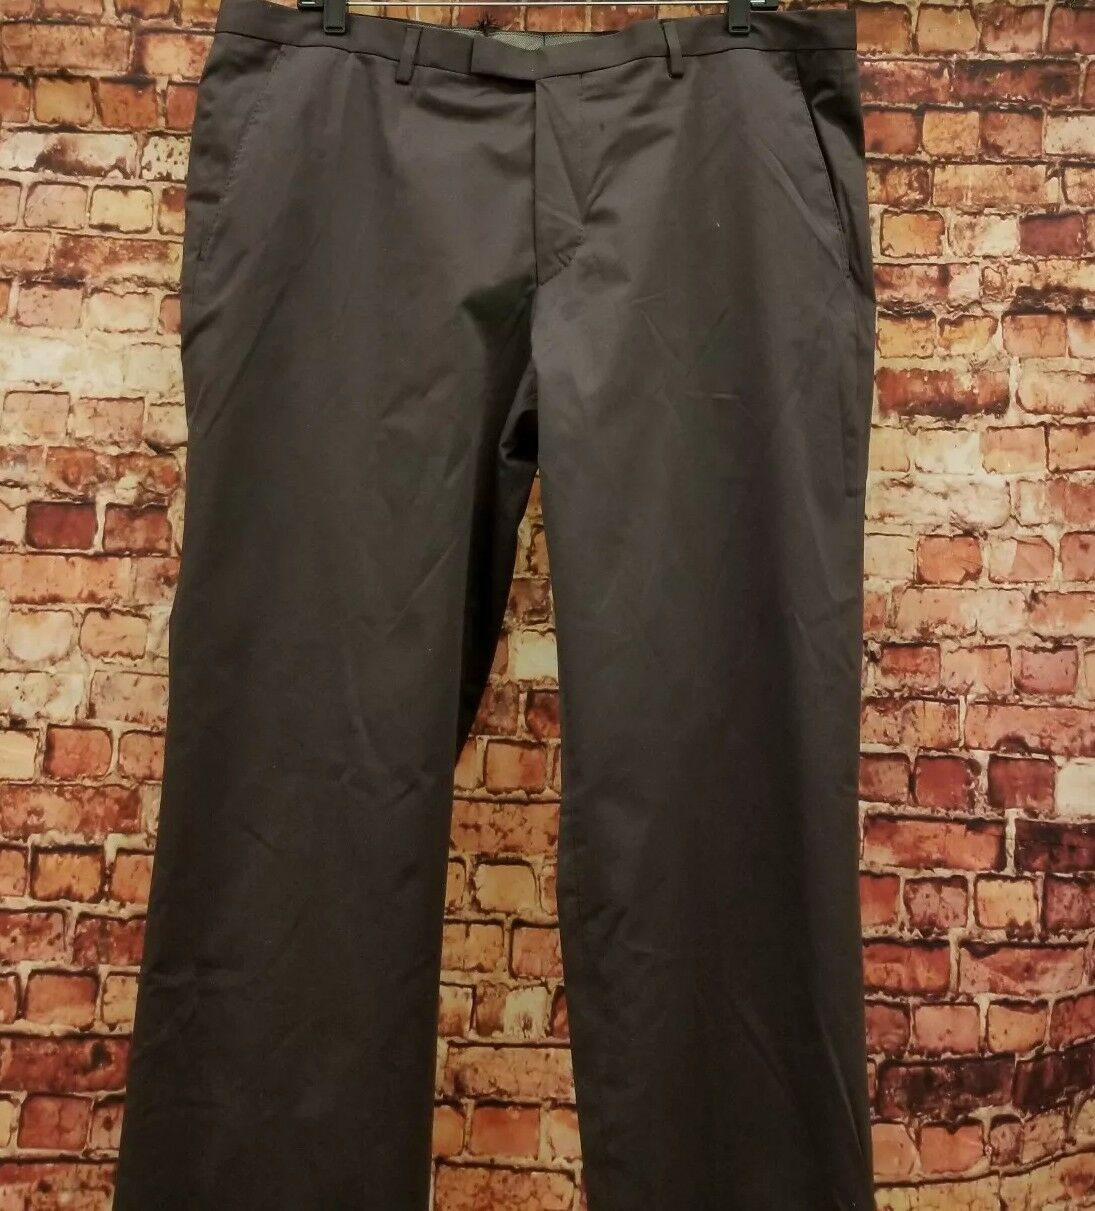 HUGO BOSS LEENON  BROWN CASUAL DRESS PANTS SIZE 38R COTTON BLEND